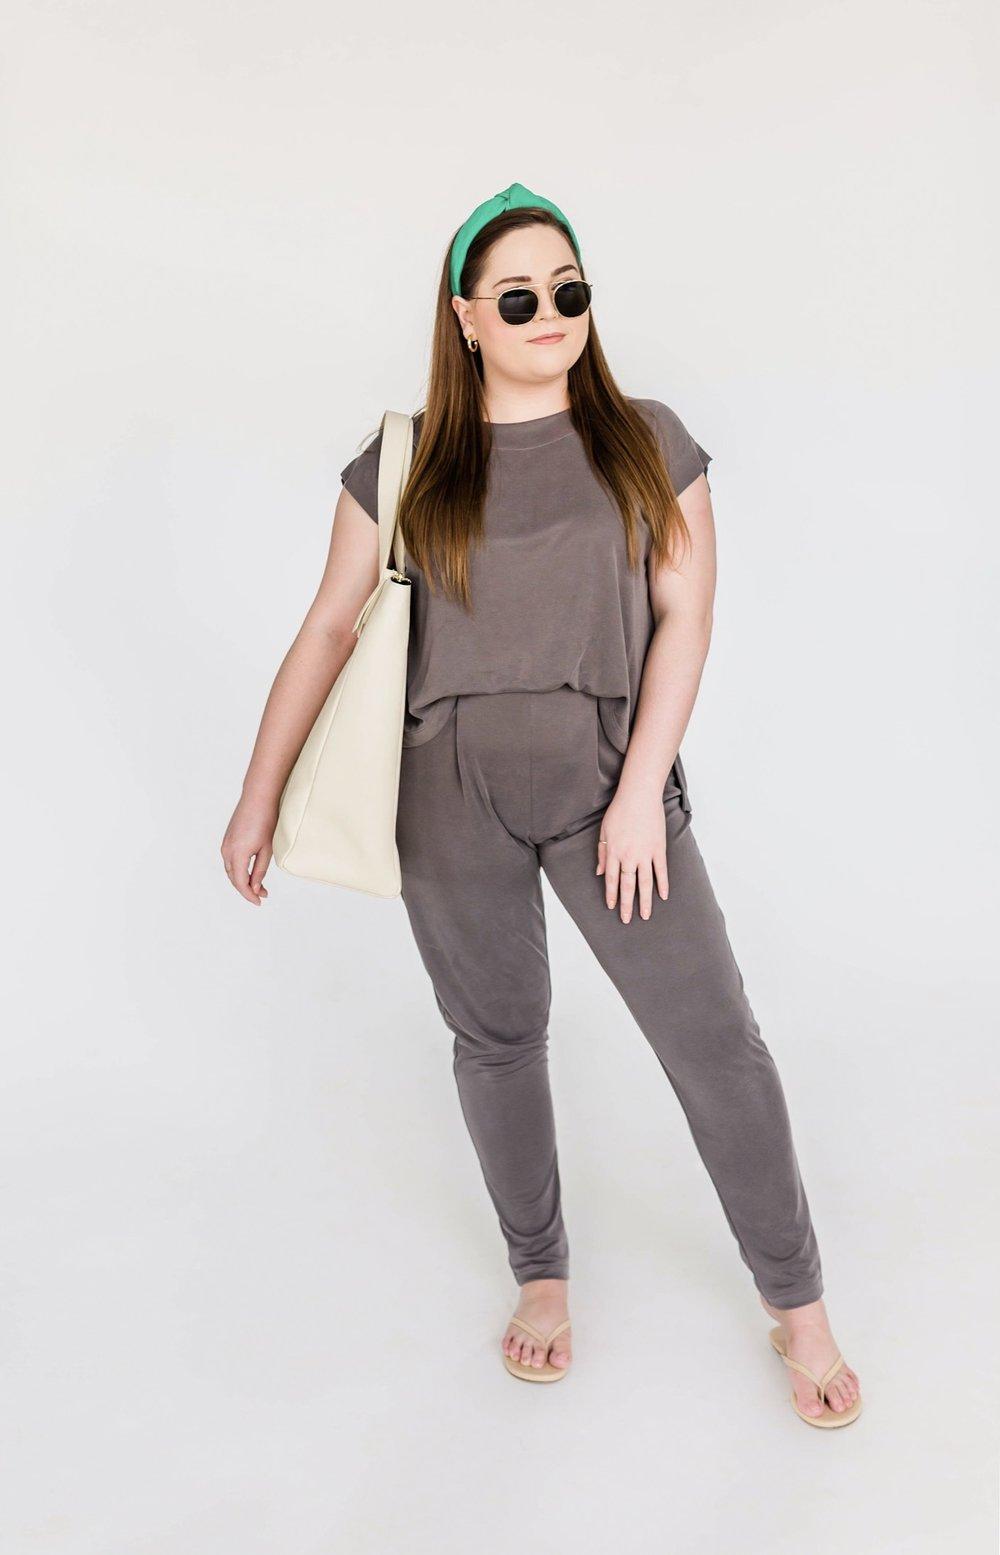 Rebecca's Look - What She's Wearing:Lele Sadoughi HeadbandIllesteva SunglassesJennifer Zeuner HoopsLife Proper Flight ToteTkees Sandals